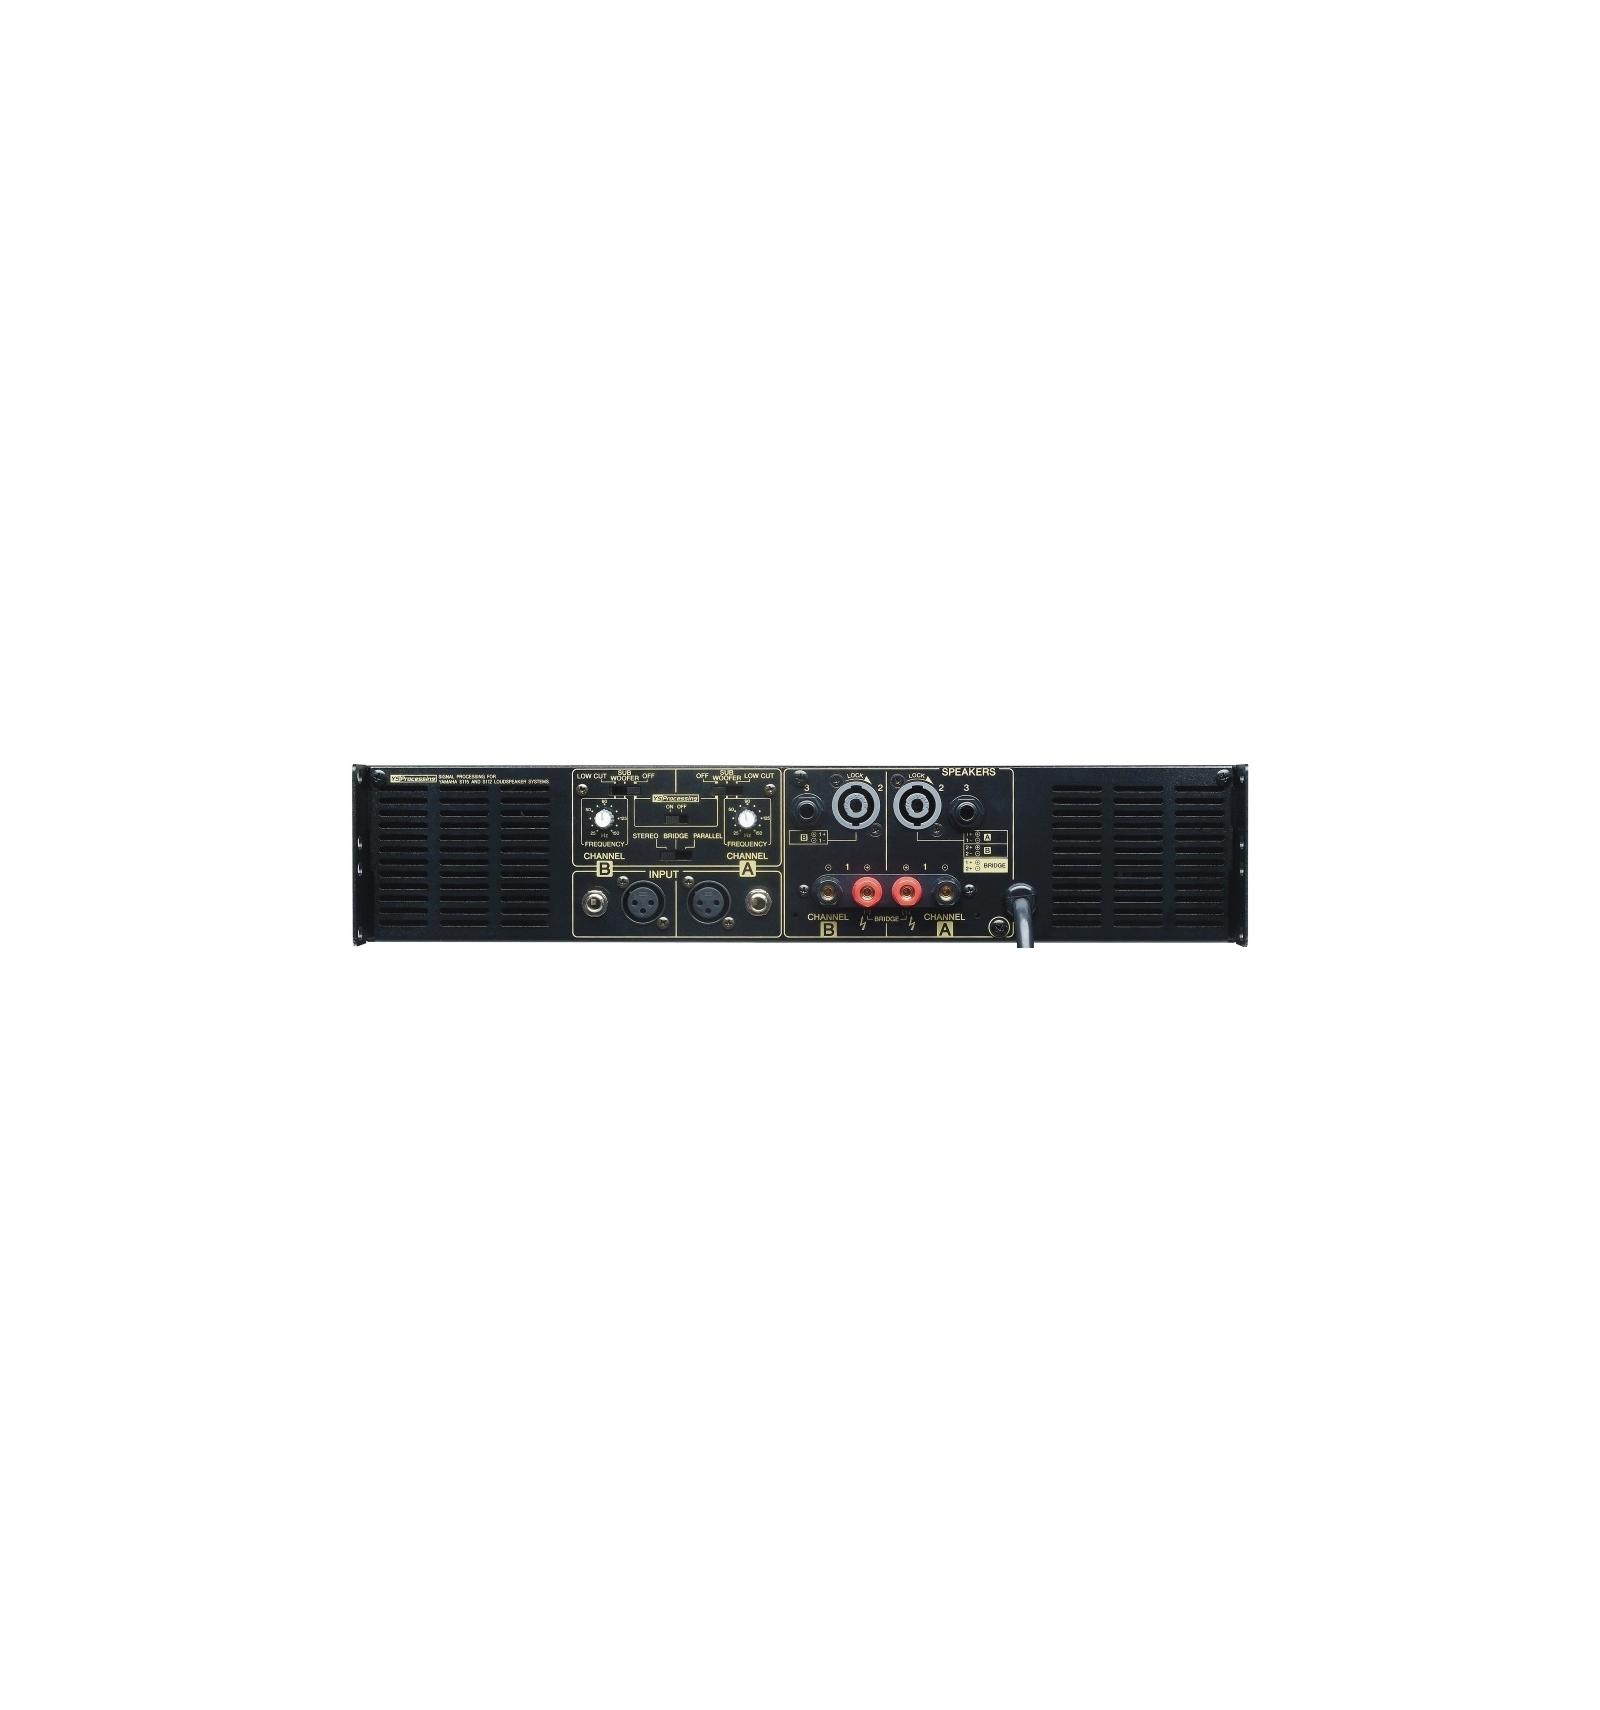 Power Amplifier Yamaha P2500s : yamaha p2500s power amplifier camaross audio hifi high detail ~ Hamham.info Haus und Dekorationen